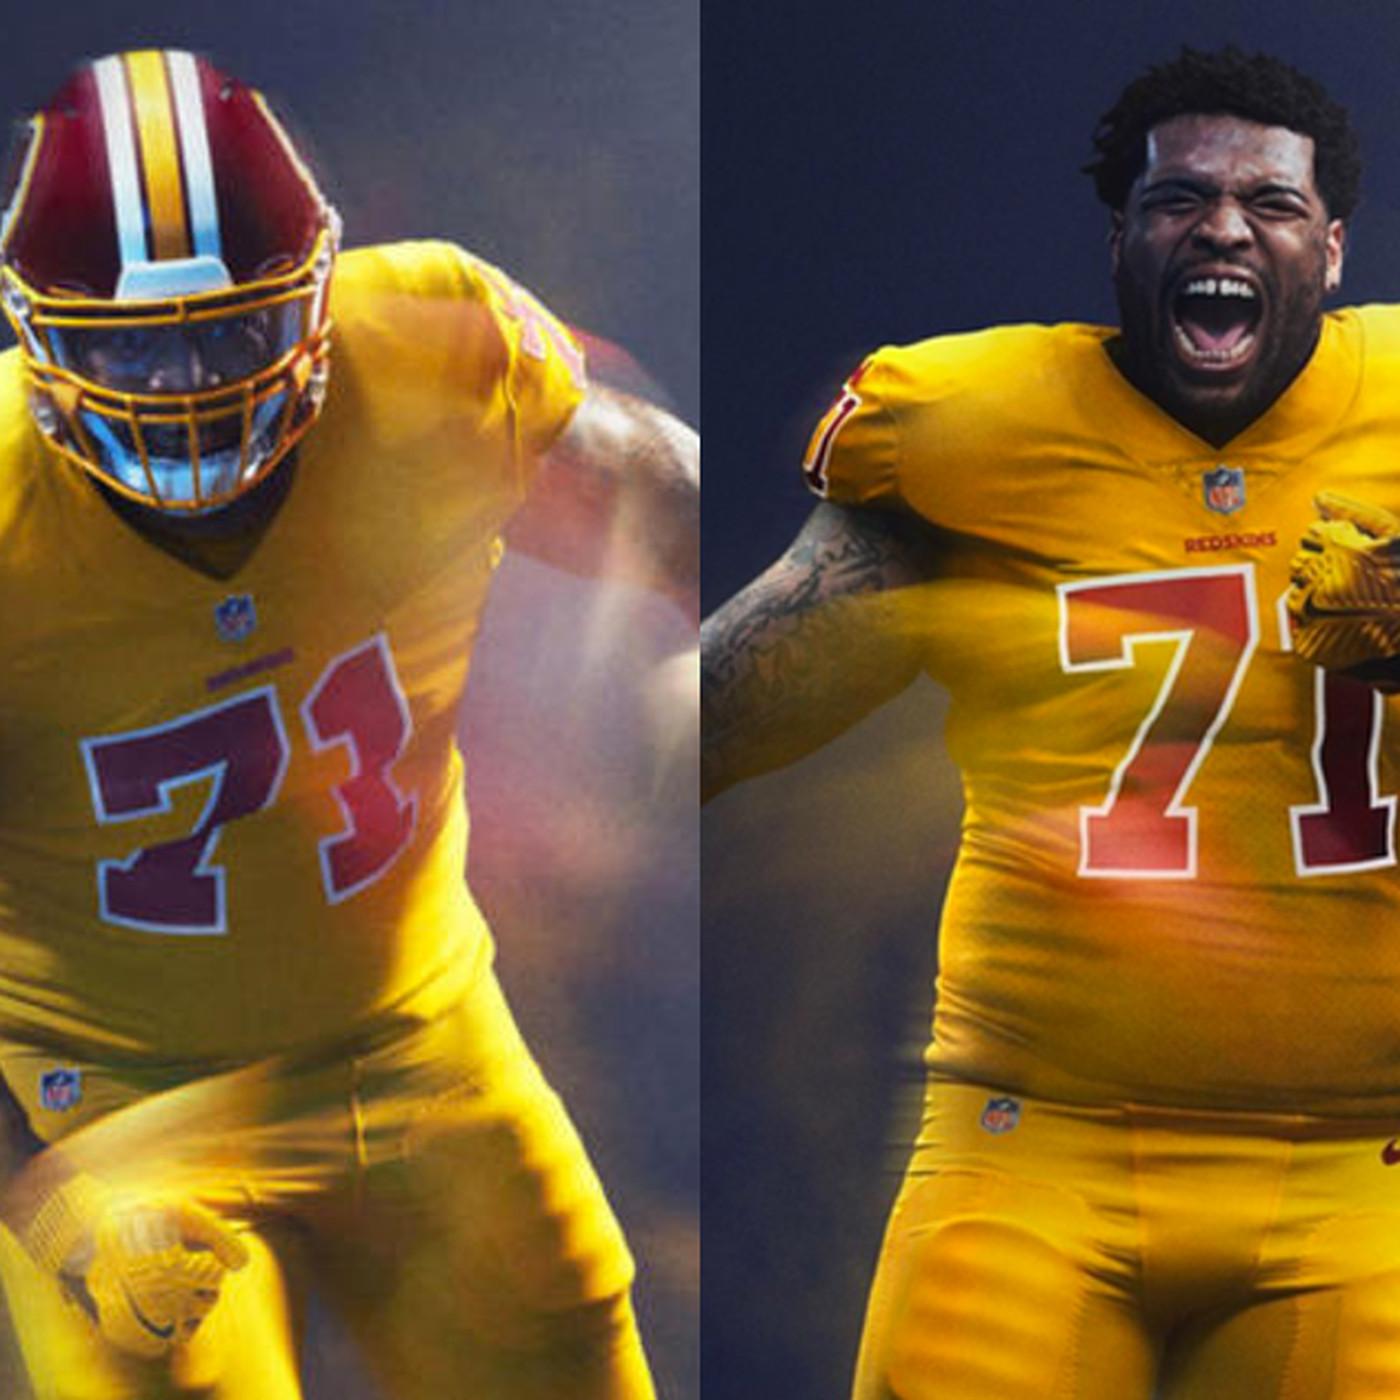 b70ade4740b Washington won't wear its Color Rush uniforms on 'Thursday Night Football'